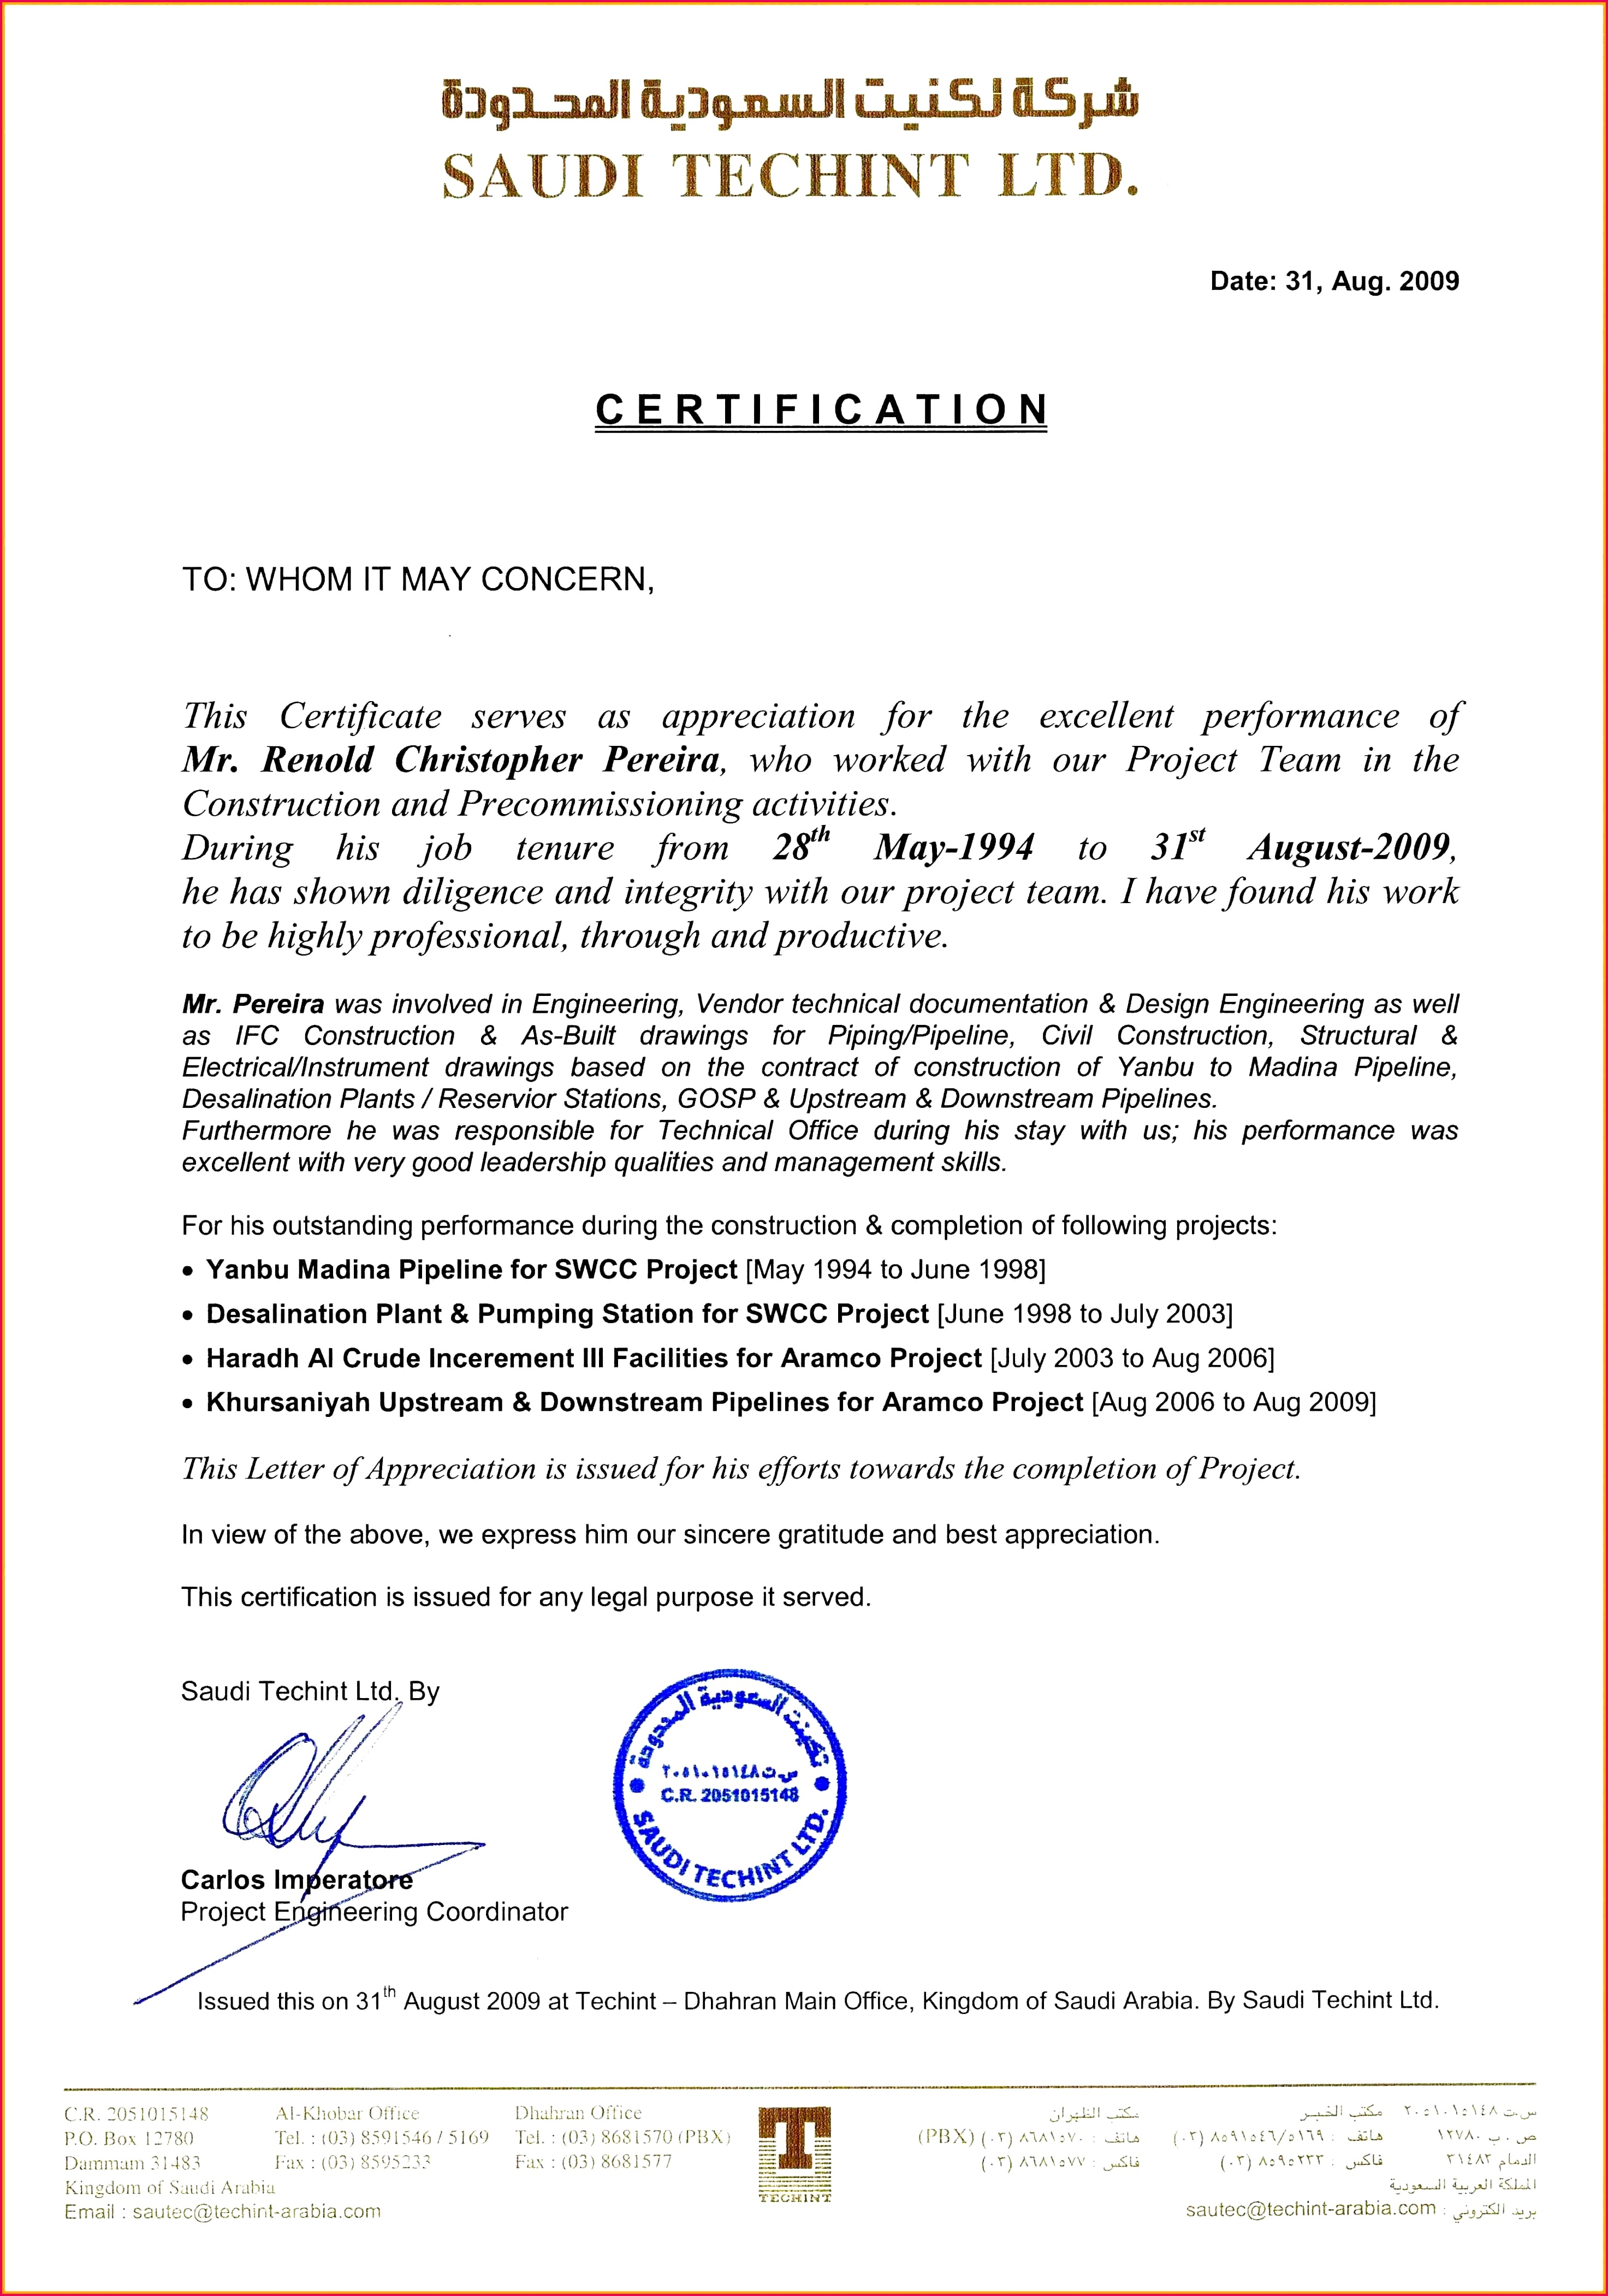 Jct Practical pletion Certificate Templat Installation pletion Certificate Sample Fresh Construction Certificate Pletion Template Image Collections